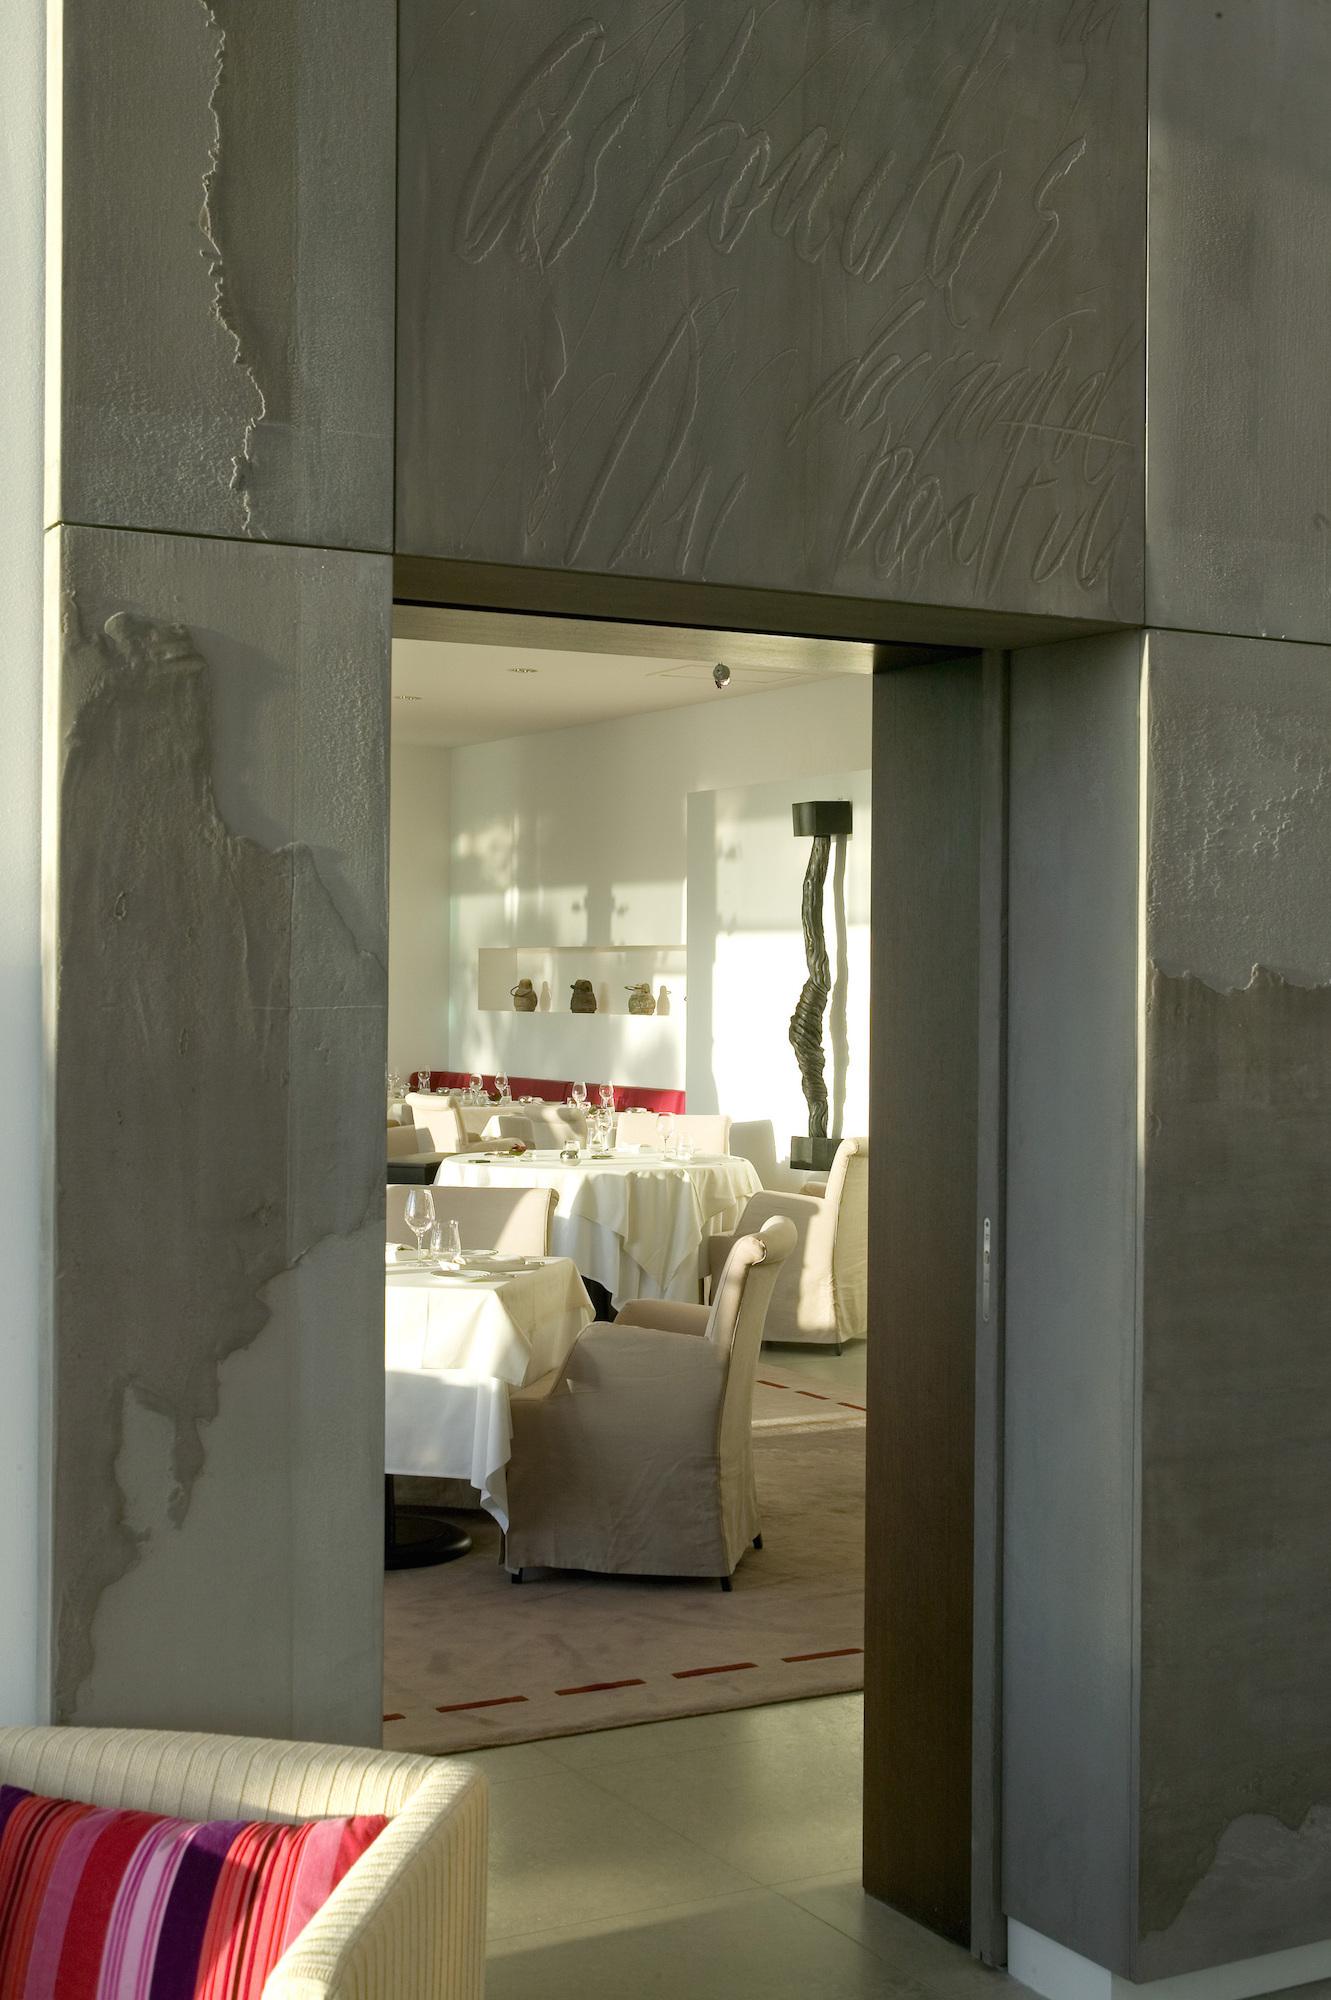 casadelmar-hotel-jean-fran-ois-bodin_34bx6832